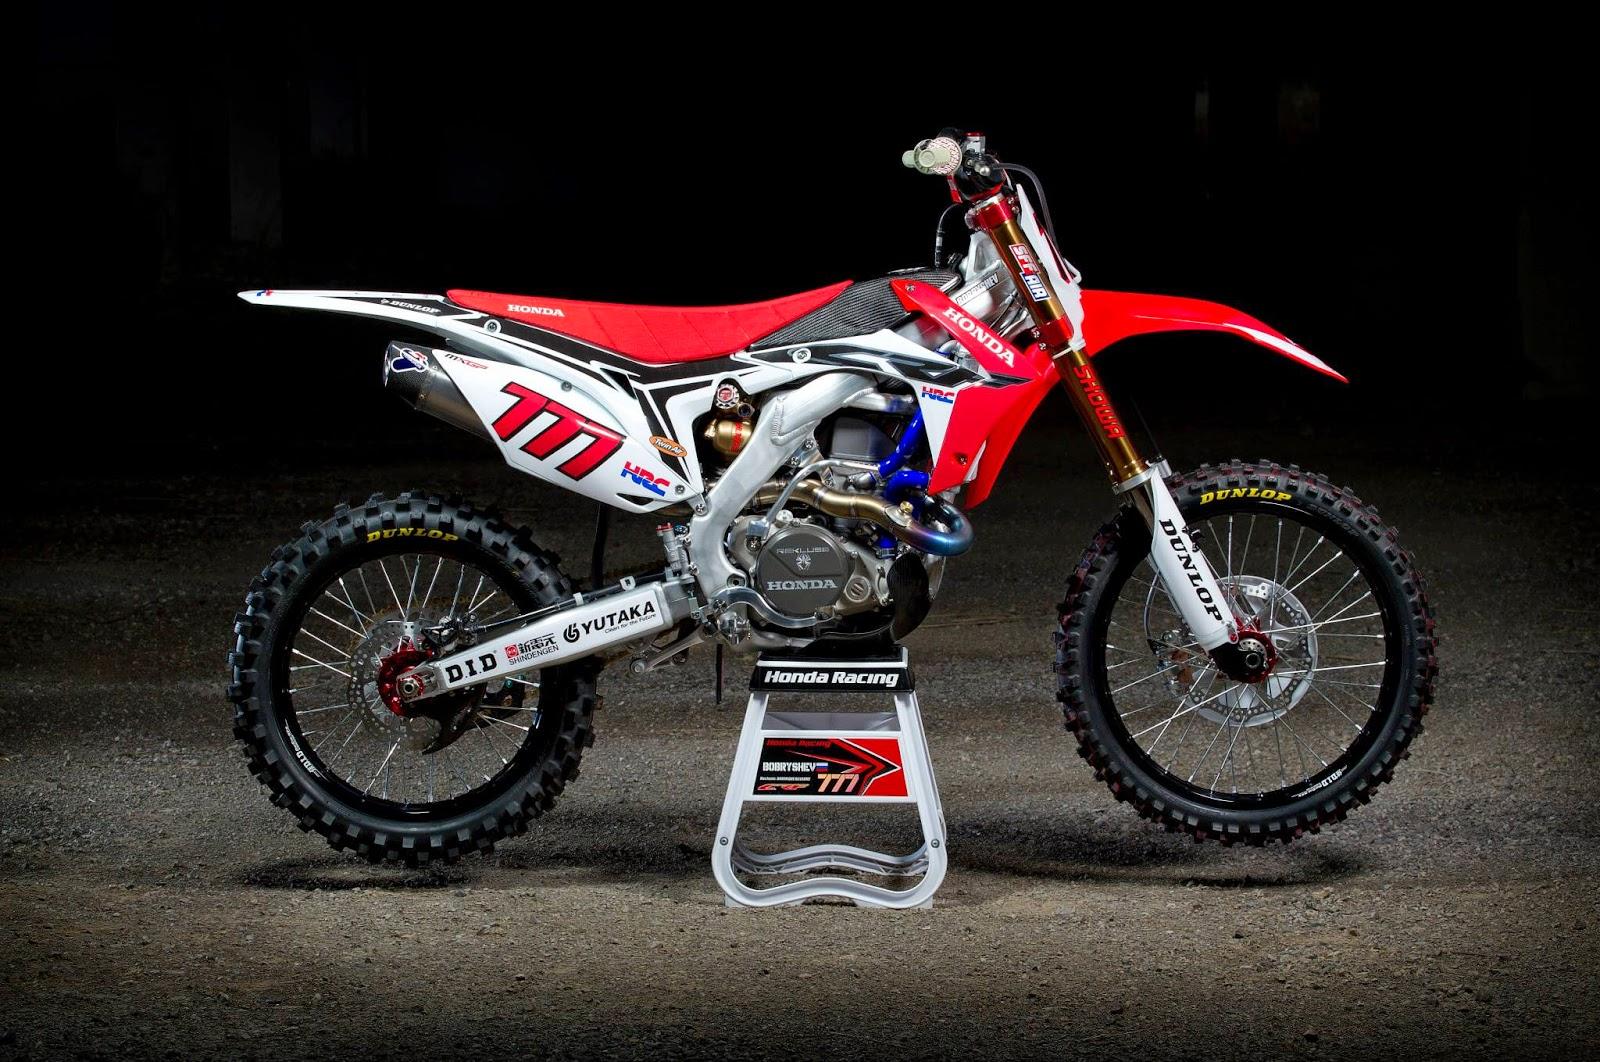 Yamaha World Champion Decal